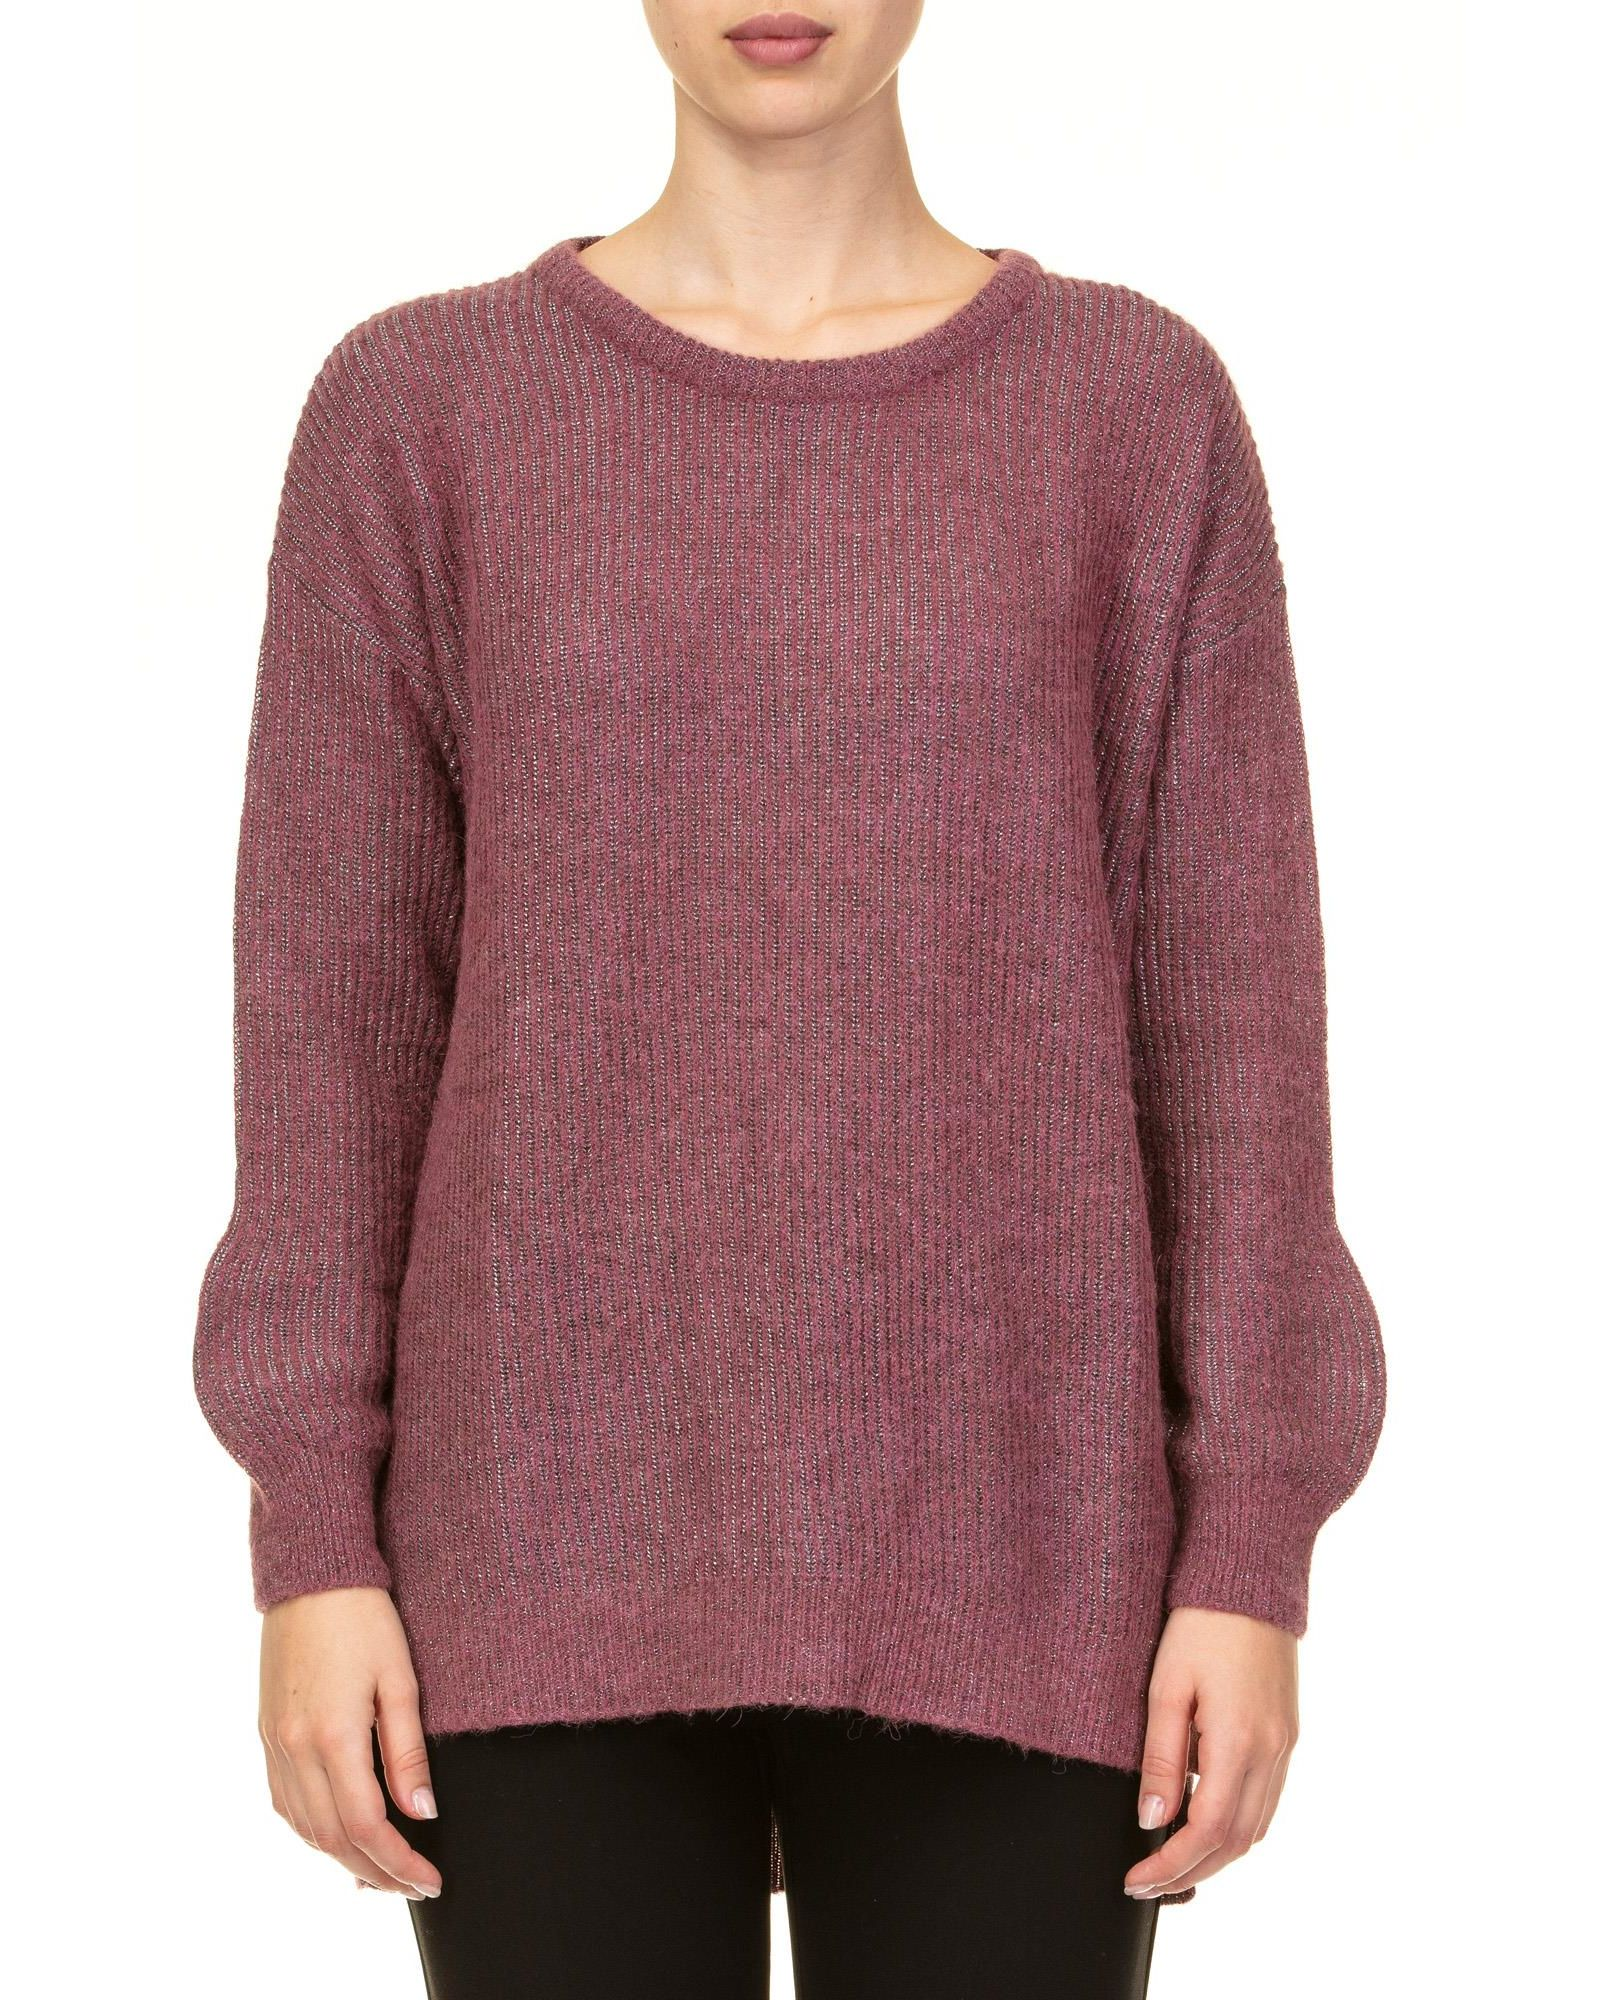 KANGRA Lurex Sweater in Raspberry